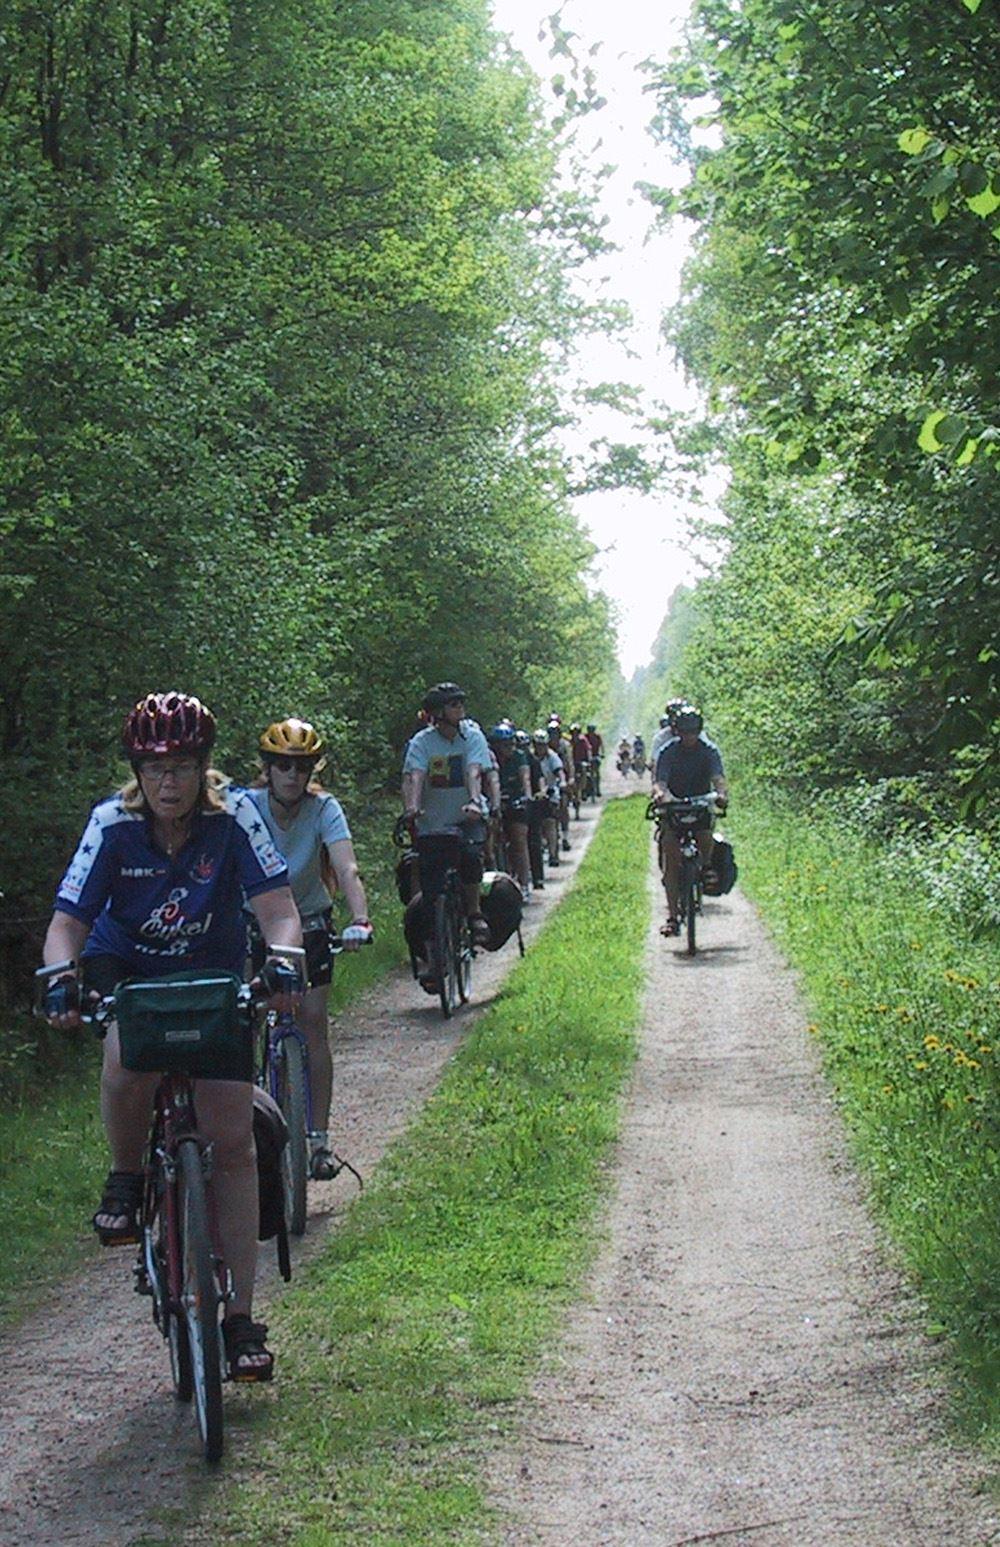 Cyclingtour Banvallsleden (Ryssby-Vislanda) 25 km